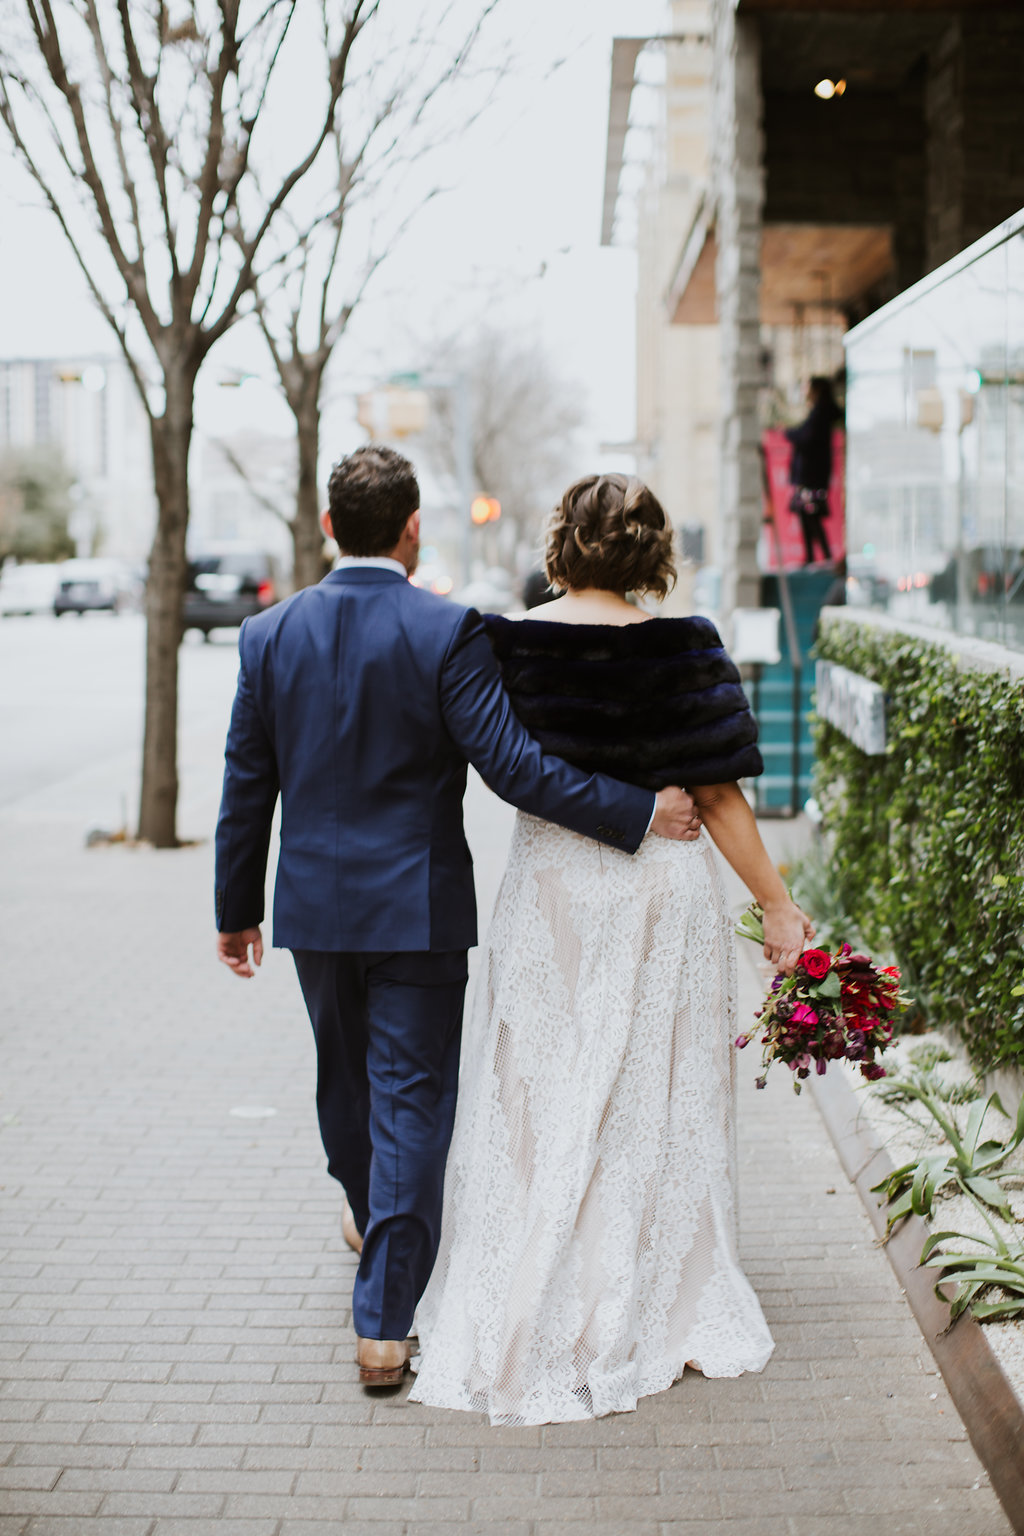 Paige-Newton-Intimate-Wedding-Photographer-Malverde-Wedding-Photography0001.jpg